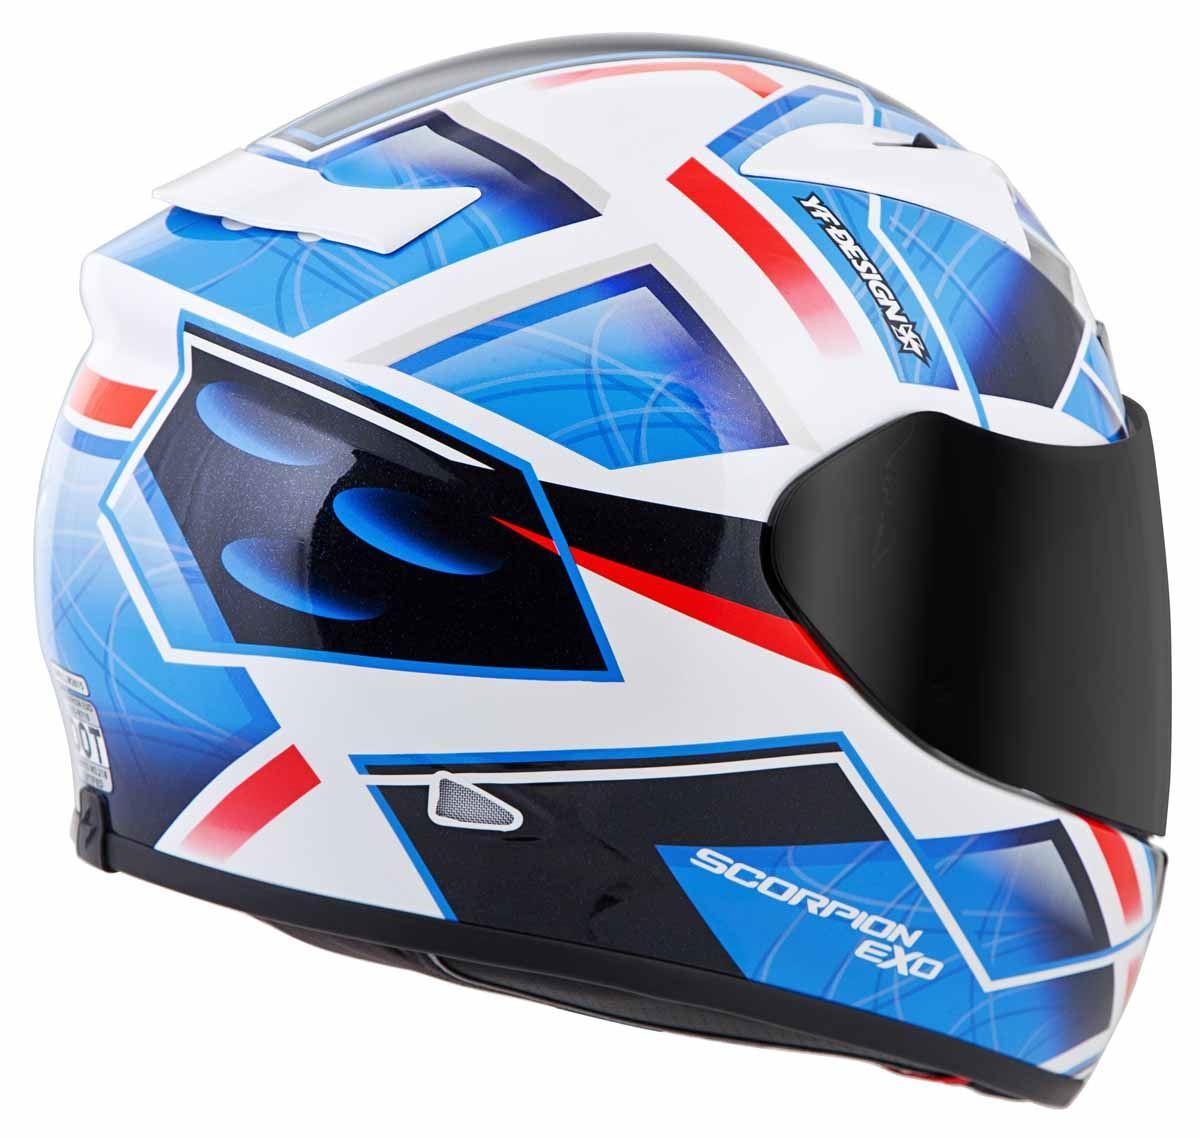 Scorpion-EXO-R710-Helmet-Fiberglass-Full-Face-DOT-SNELL-M2015-Certified-XS-2XL miniature 21